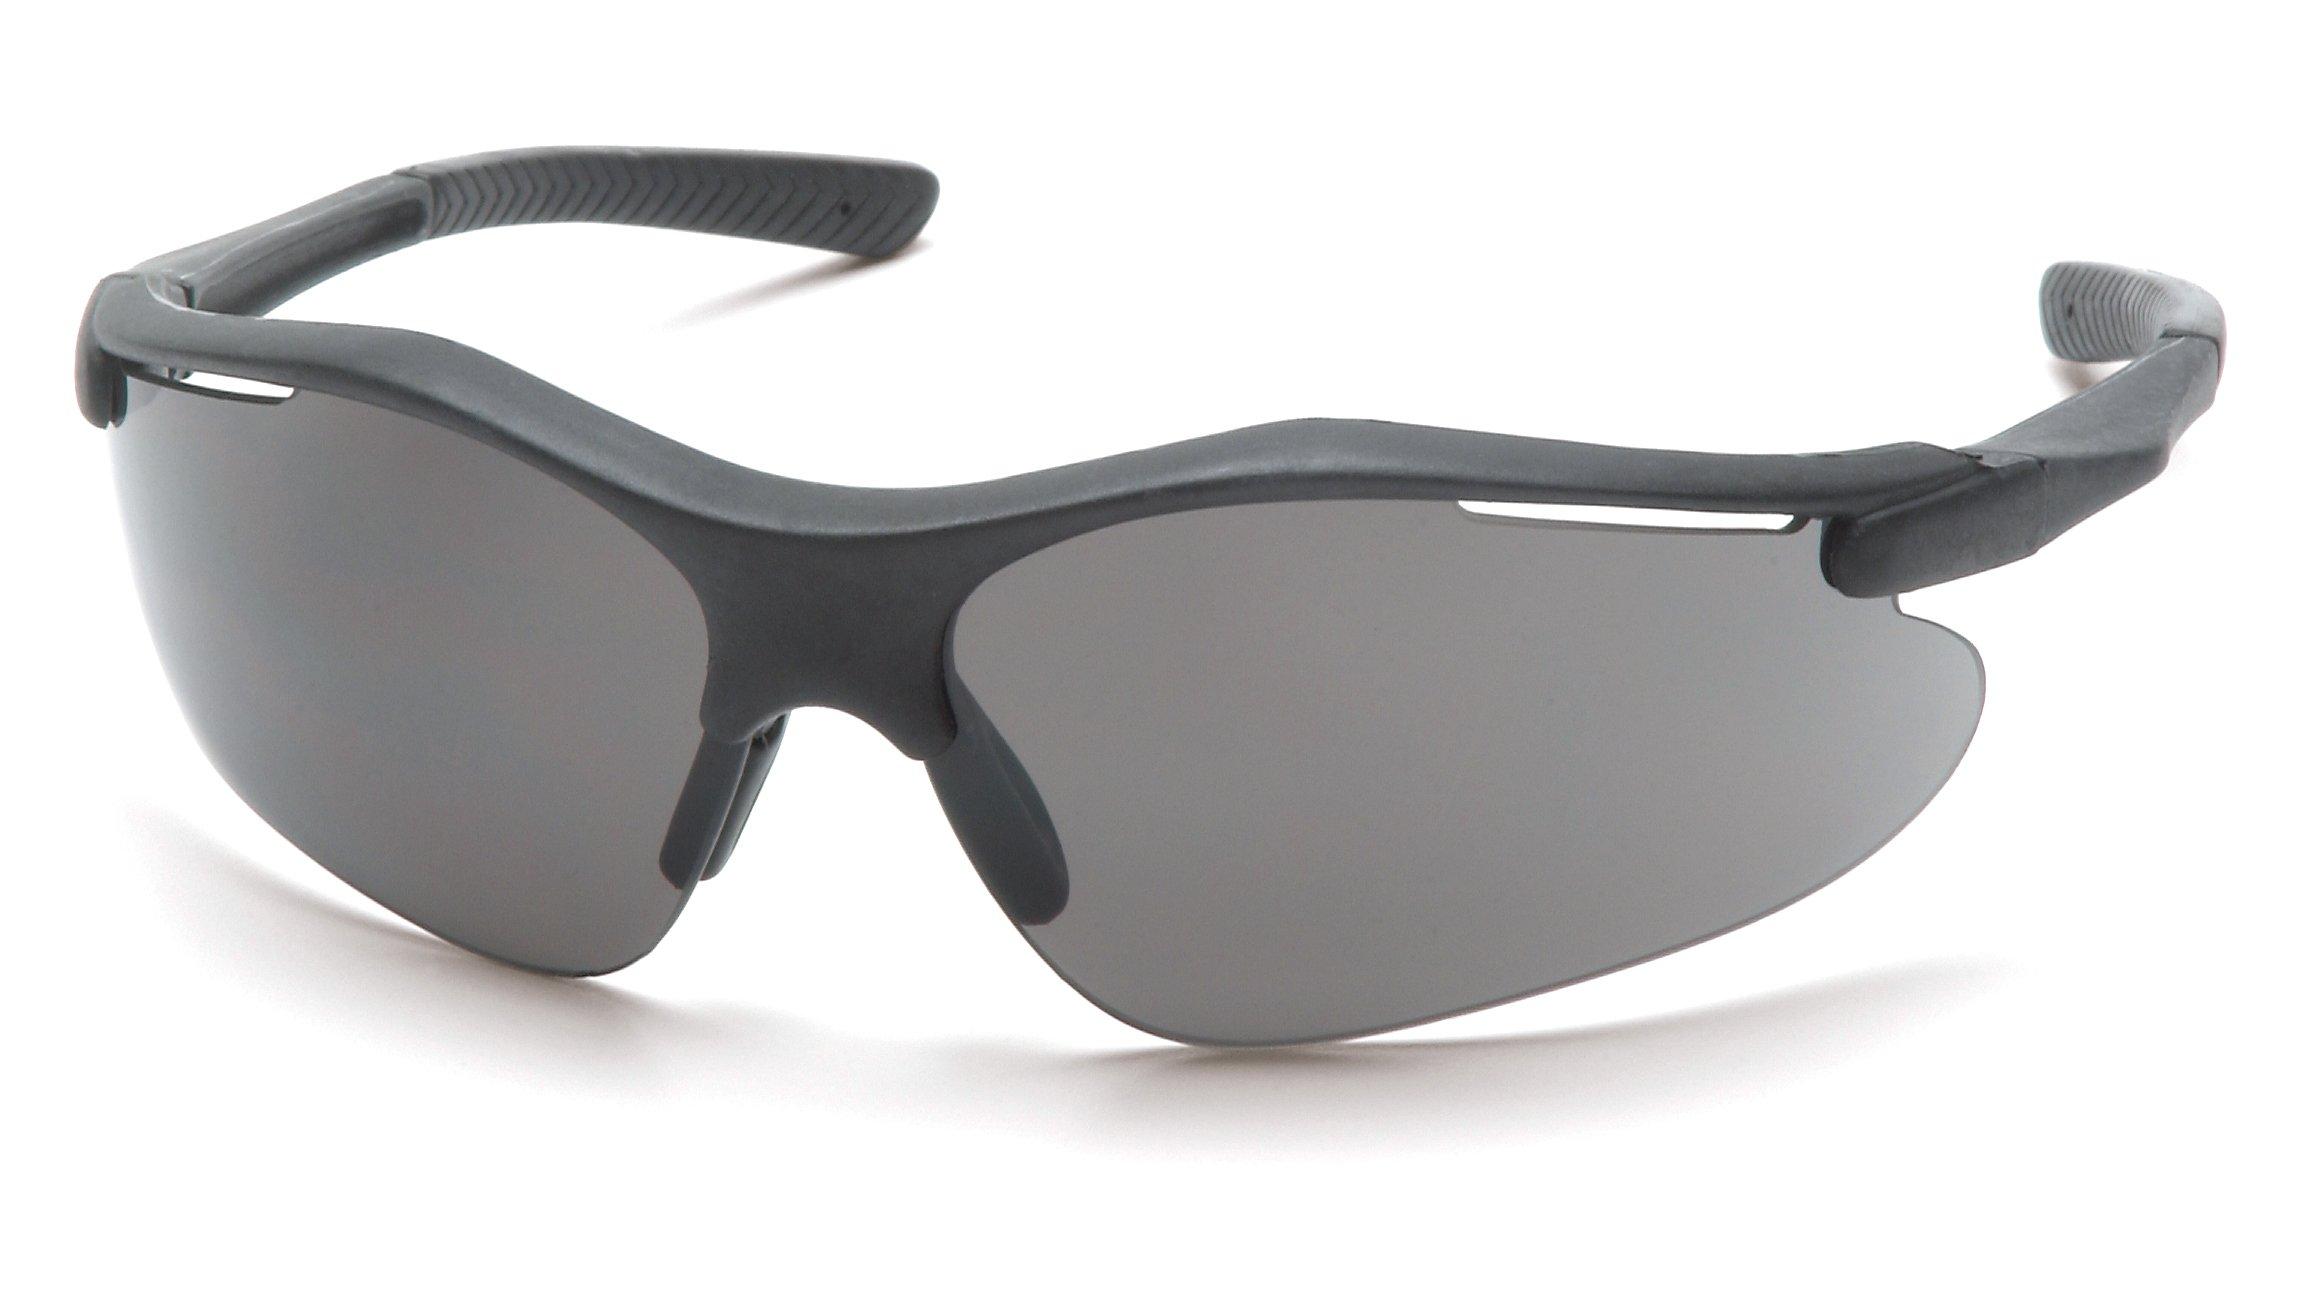 Pyramex Fortress Safety Eyewear, Gray Lens With Black Frame